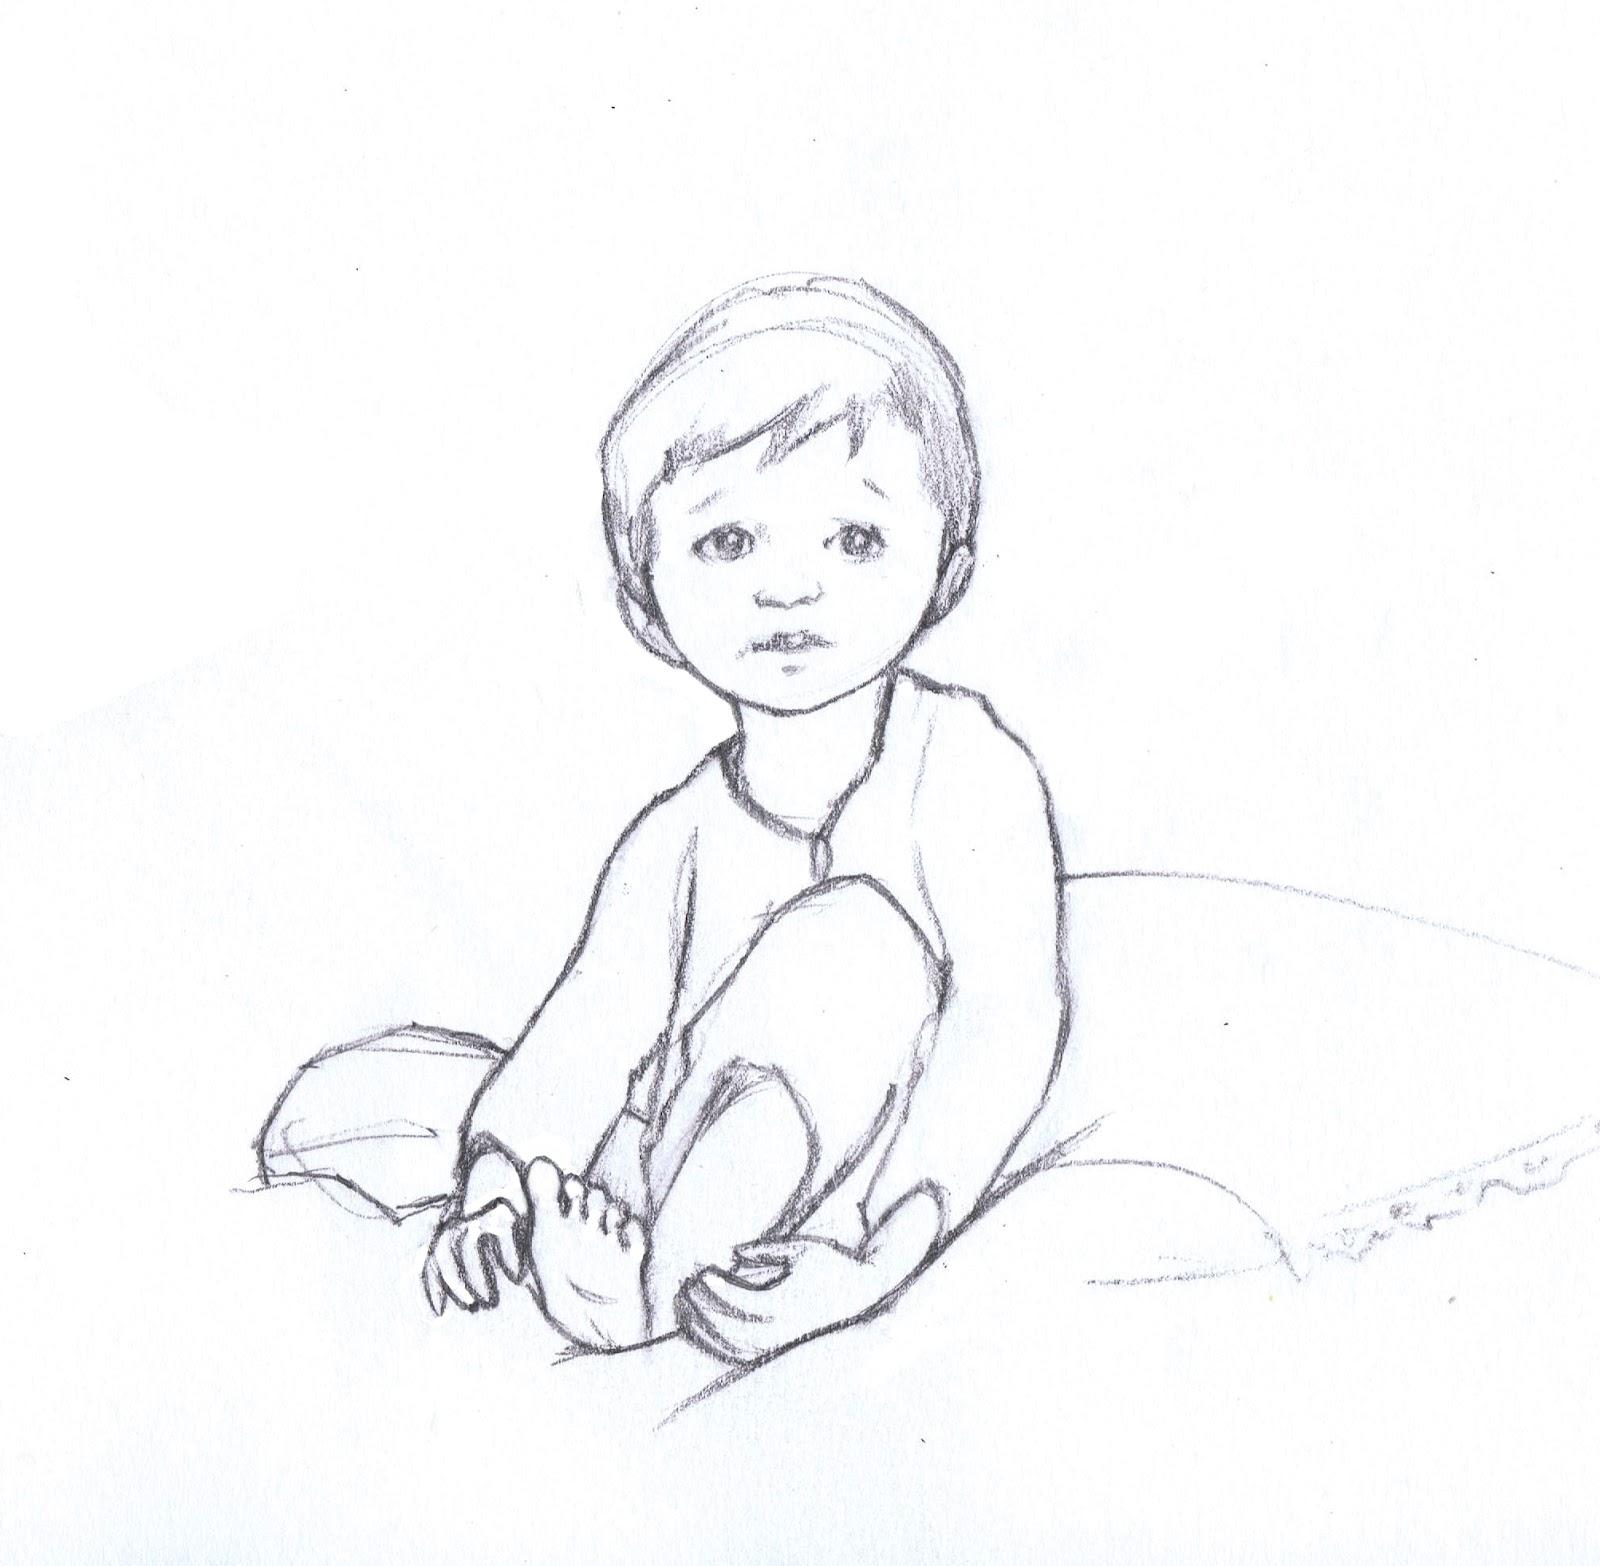 Little Boy Sketch Amy Proud Illustration